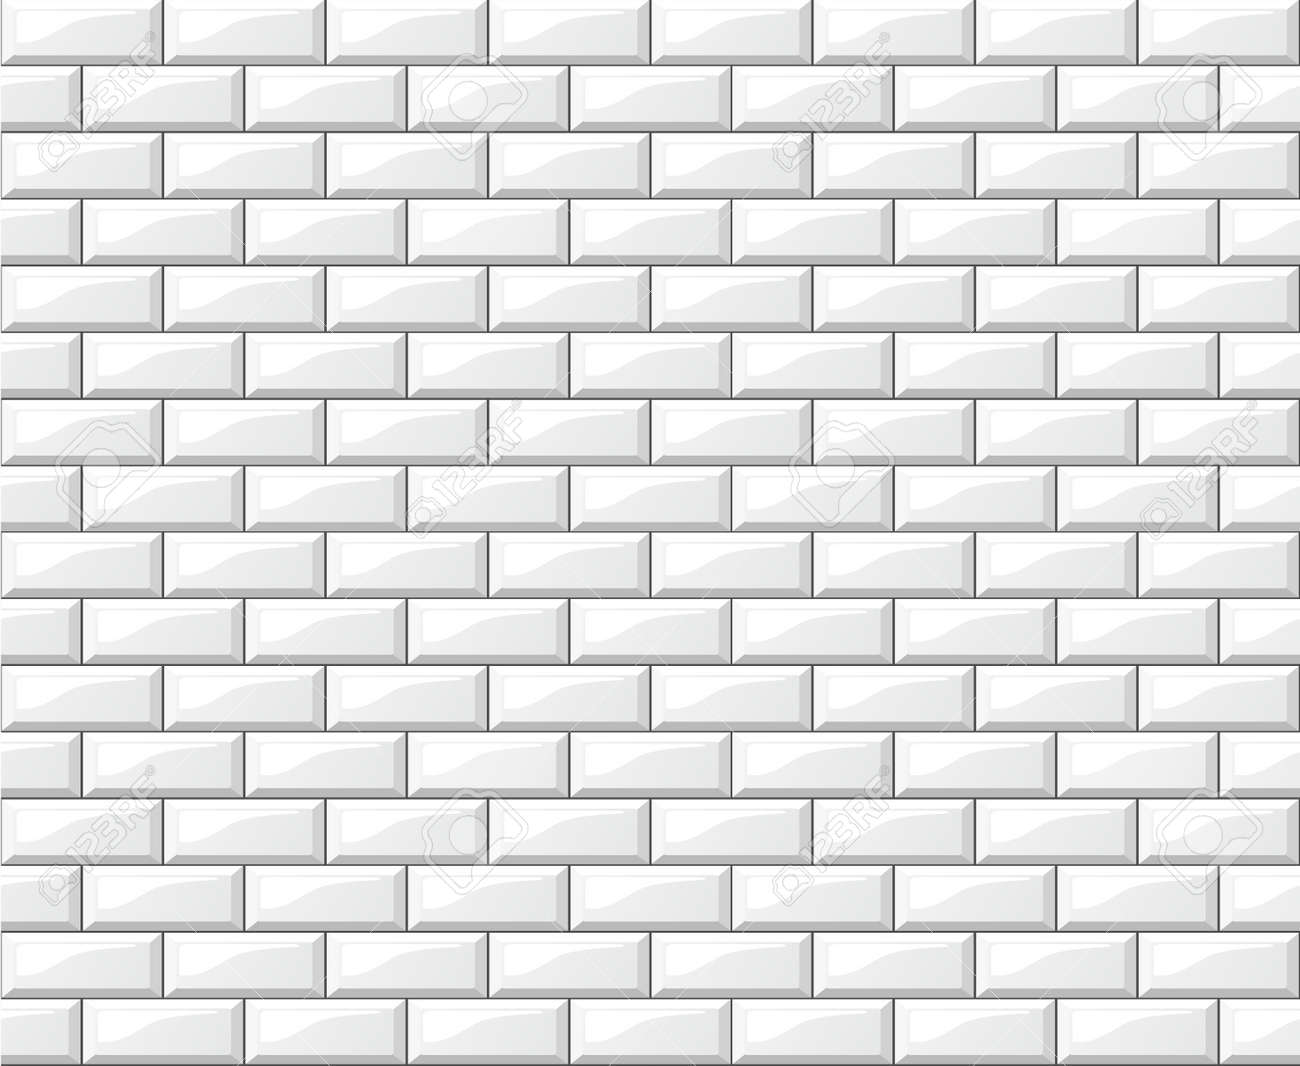 Illustration of white tiles wall background design - 101981833